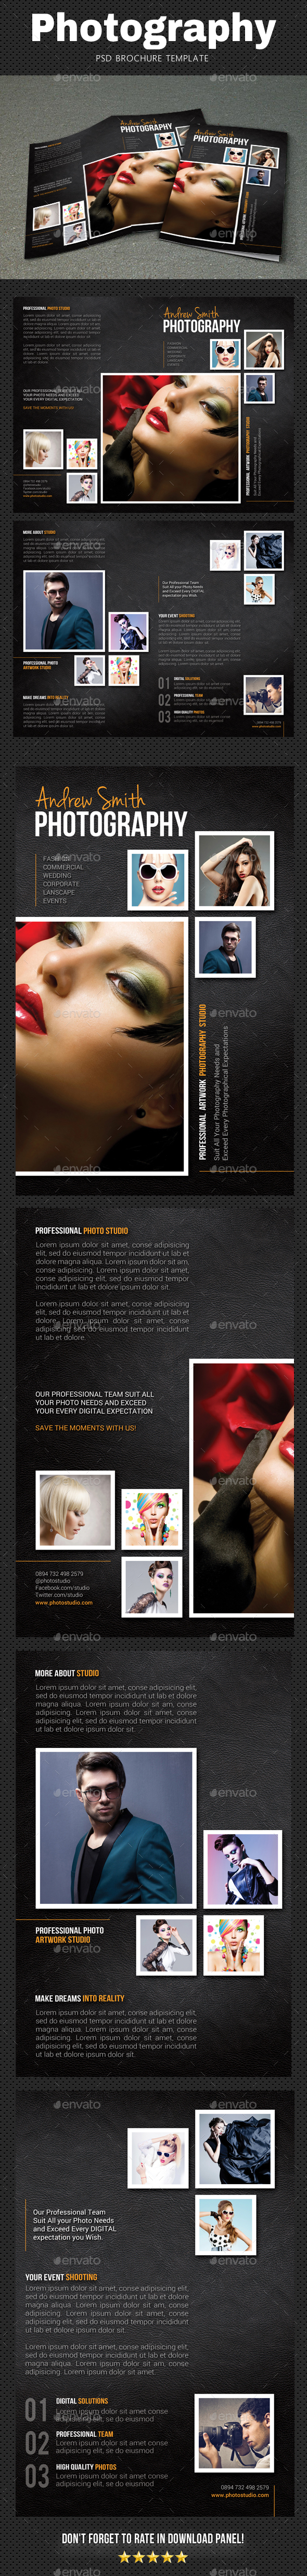 Photography Brochure 4 - Brochures Print Templates